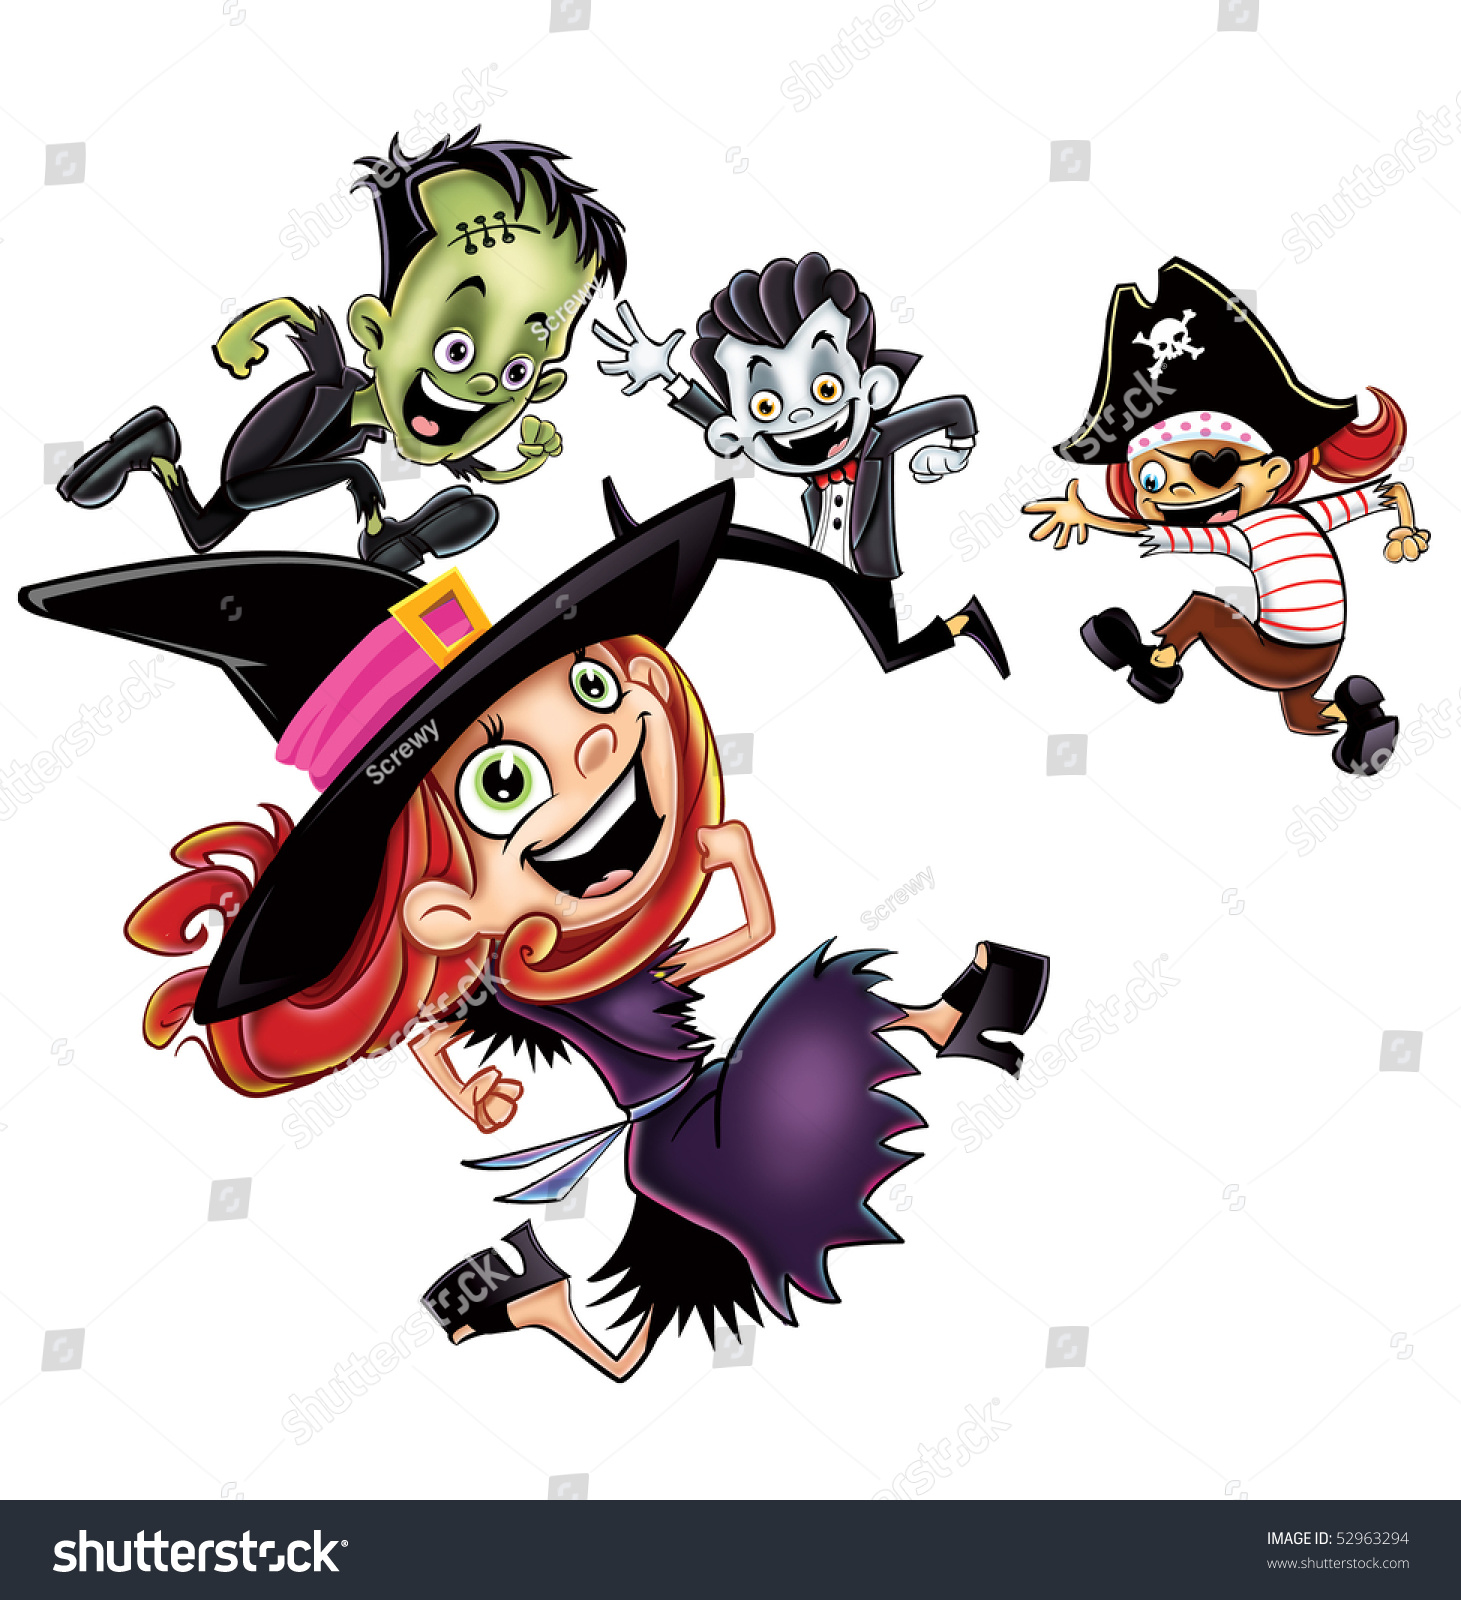 halloween kids dancing isolated - Dancing Halloween